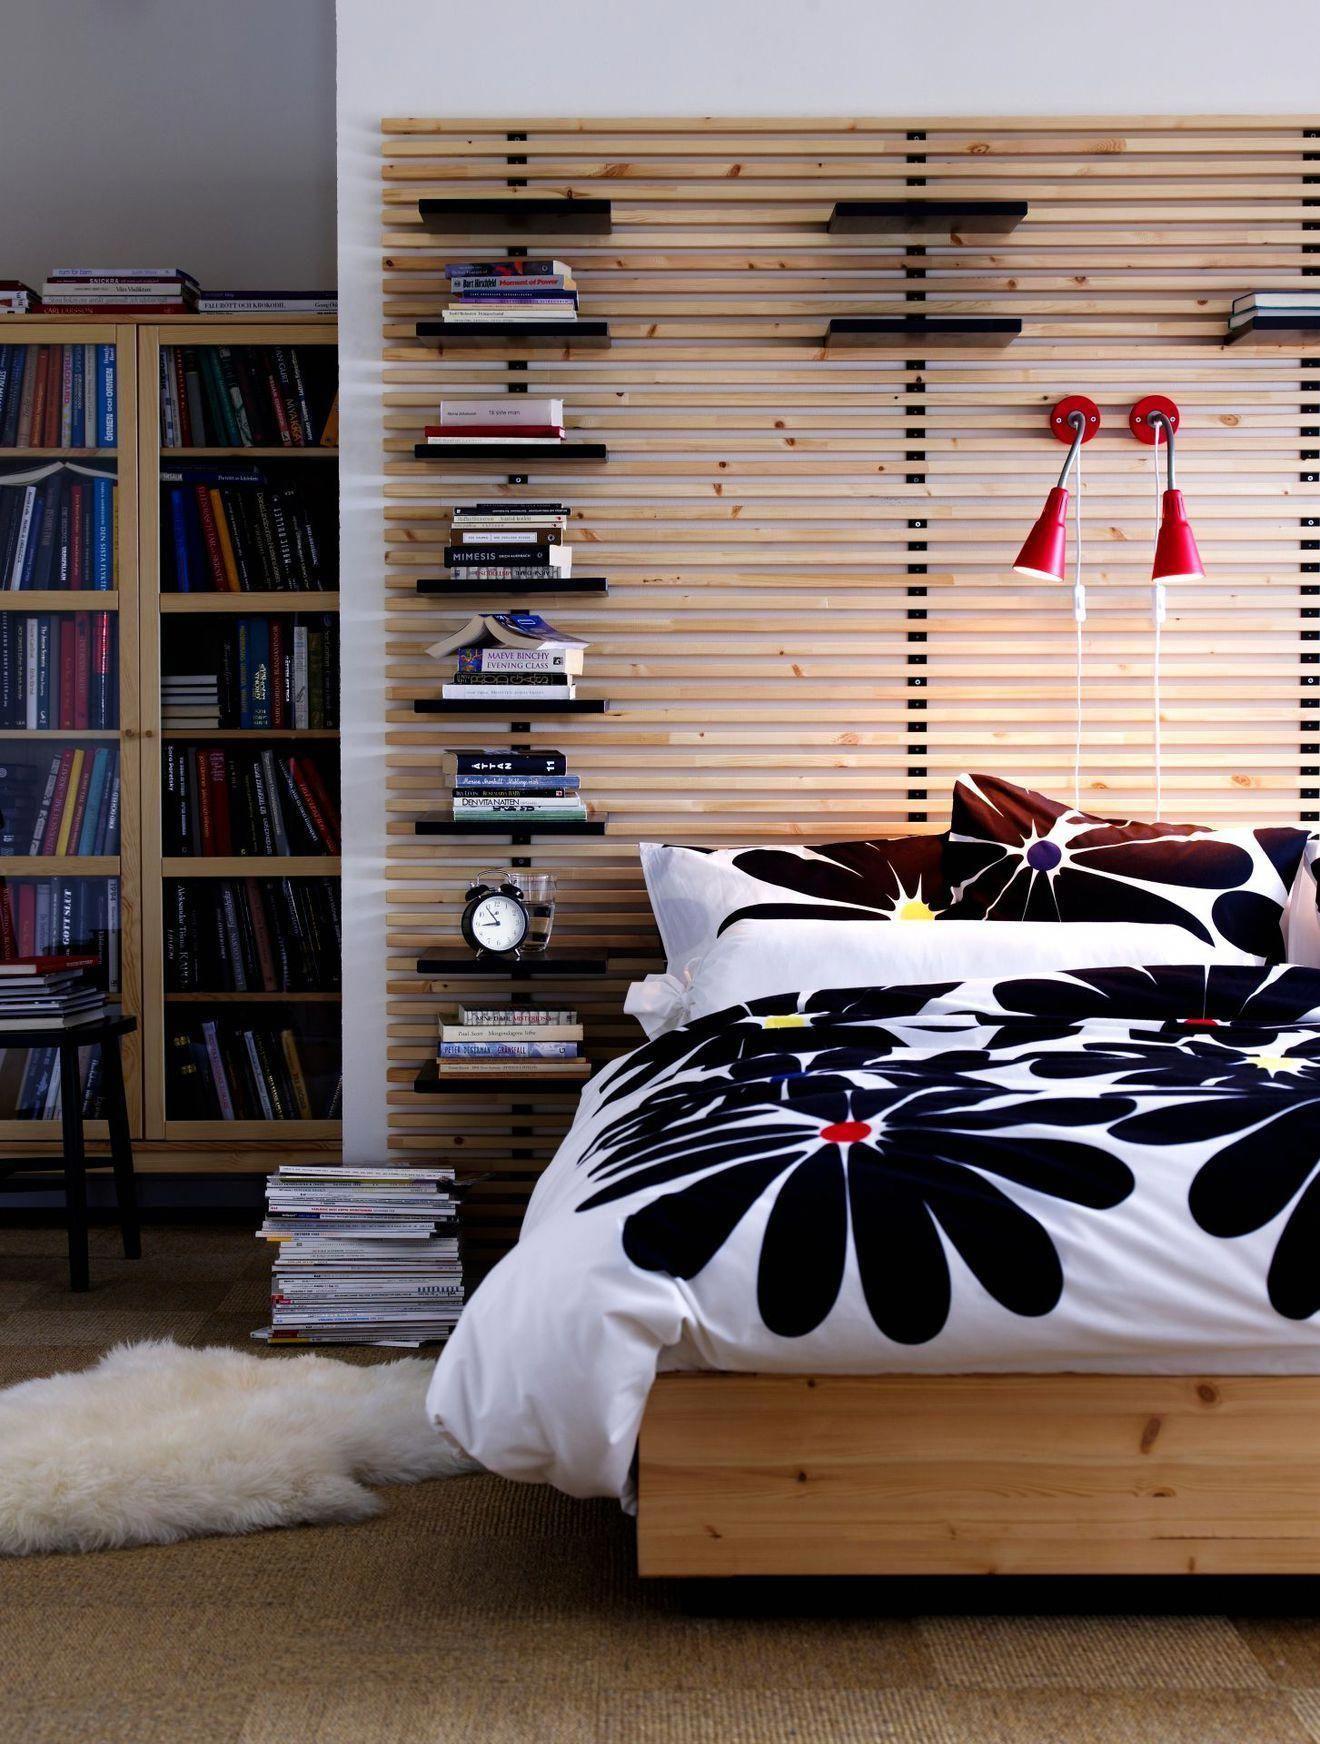 Une Tete De Lit Ikea Ideale Pour Les Rangements Ikeabedroom W 2020 Sypialnie Mandale I Pomysly Na Sypialnie